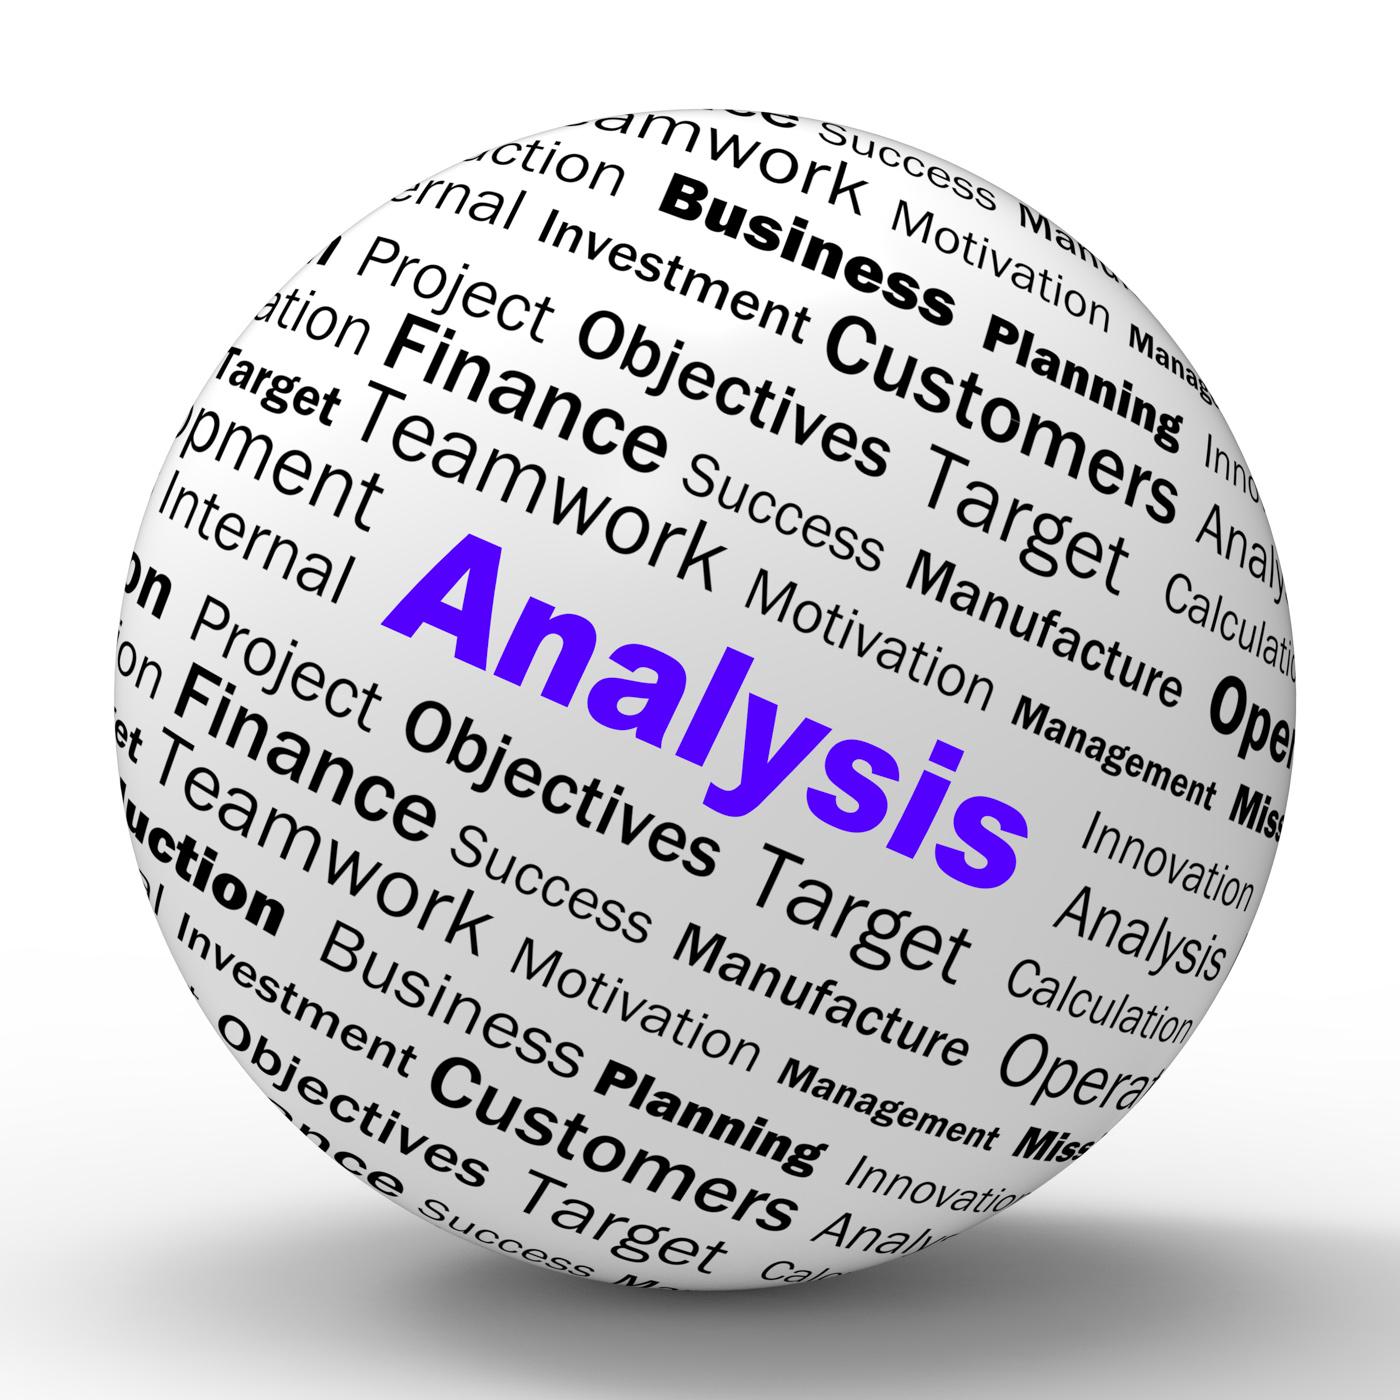 Beautiful Analysis Sphere Definition Shows Exhaustive Examination Or Verificatio